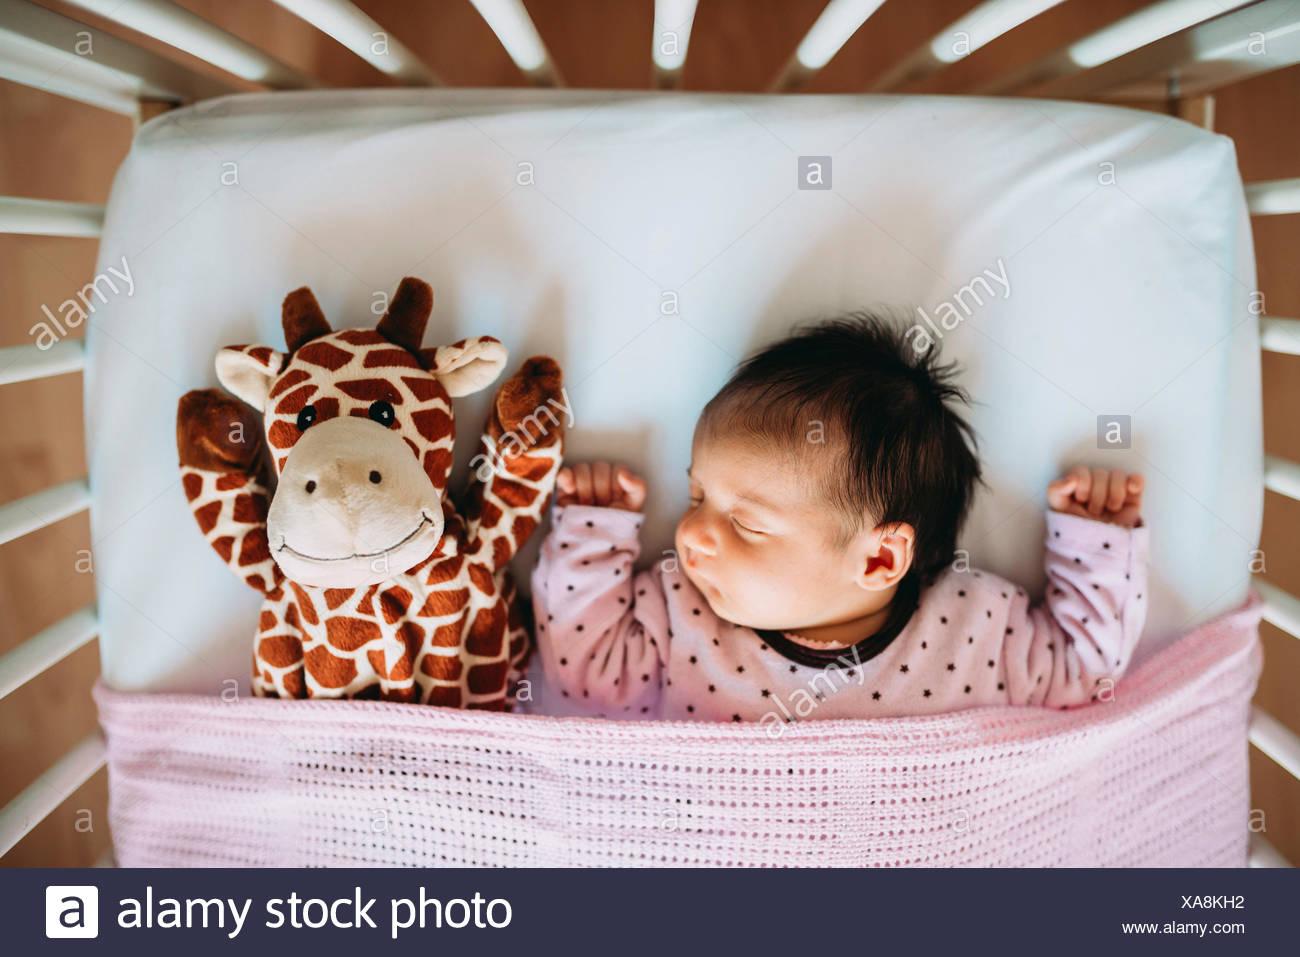 420a690b9 Newborn baby girl sleeping in crib with a plush giraffe Stock Photo ...